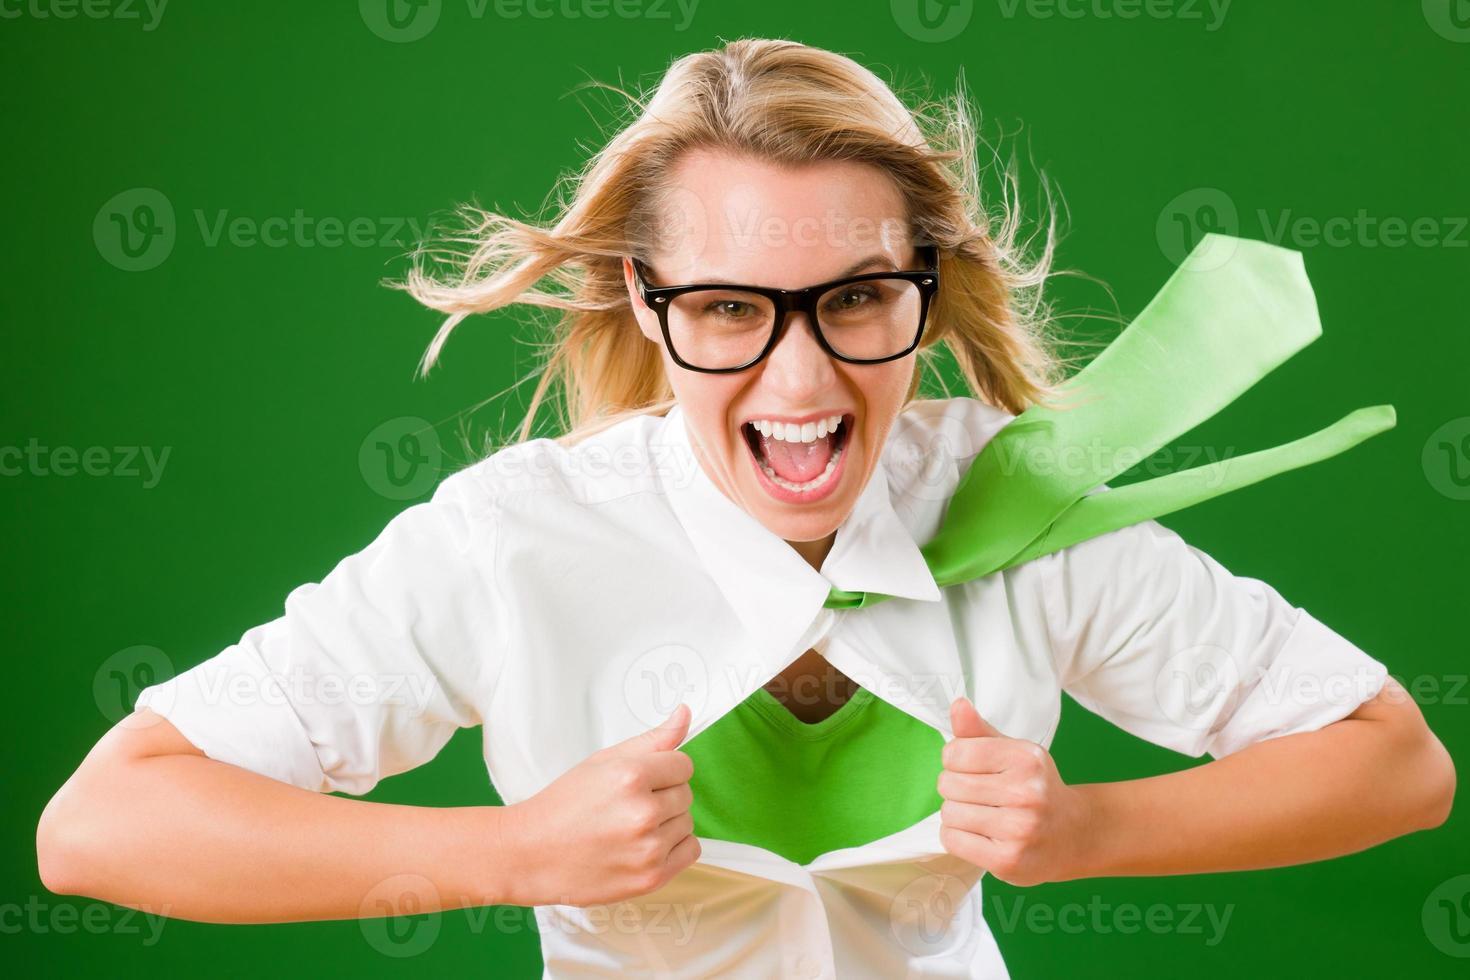 travestimento rivelatore del supereroe femminile verde foto